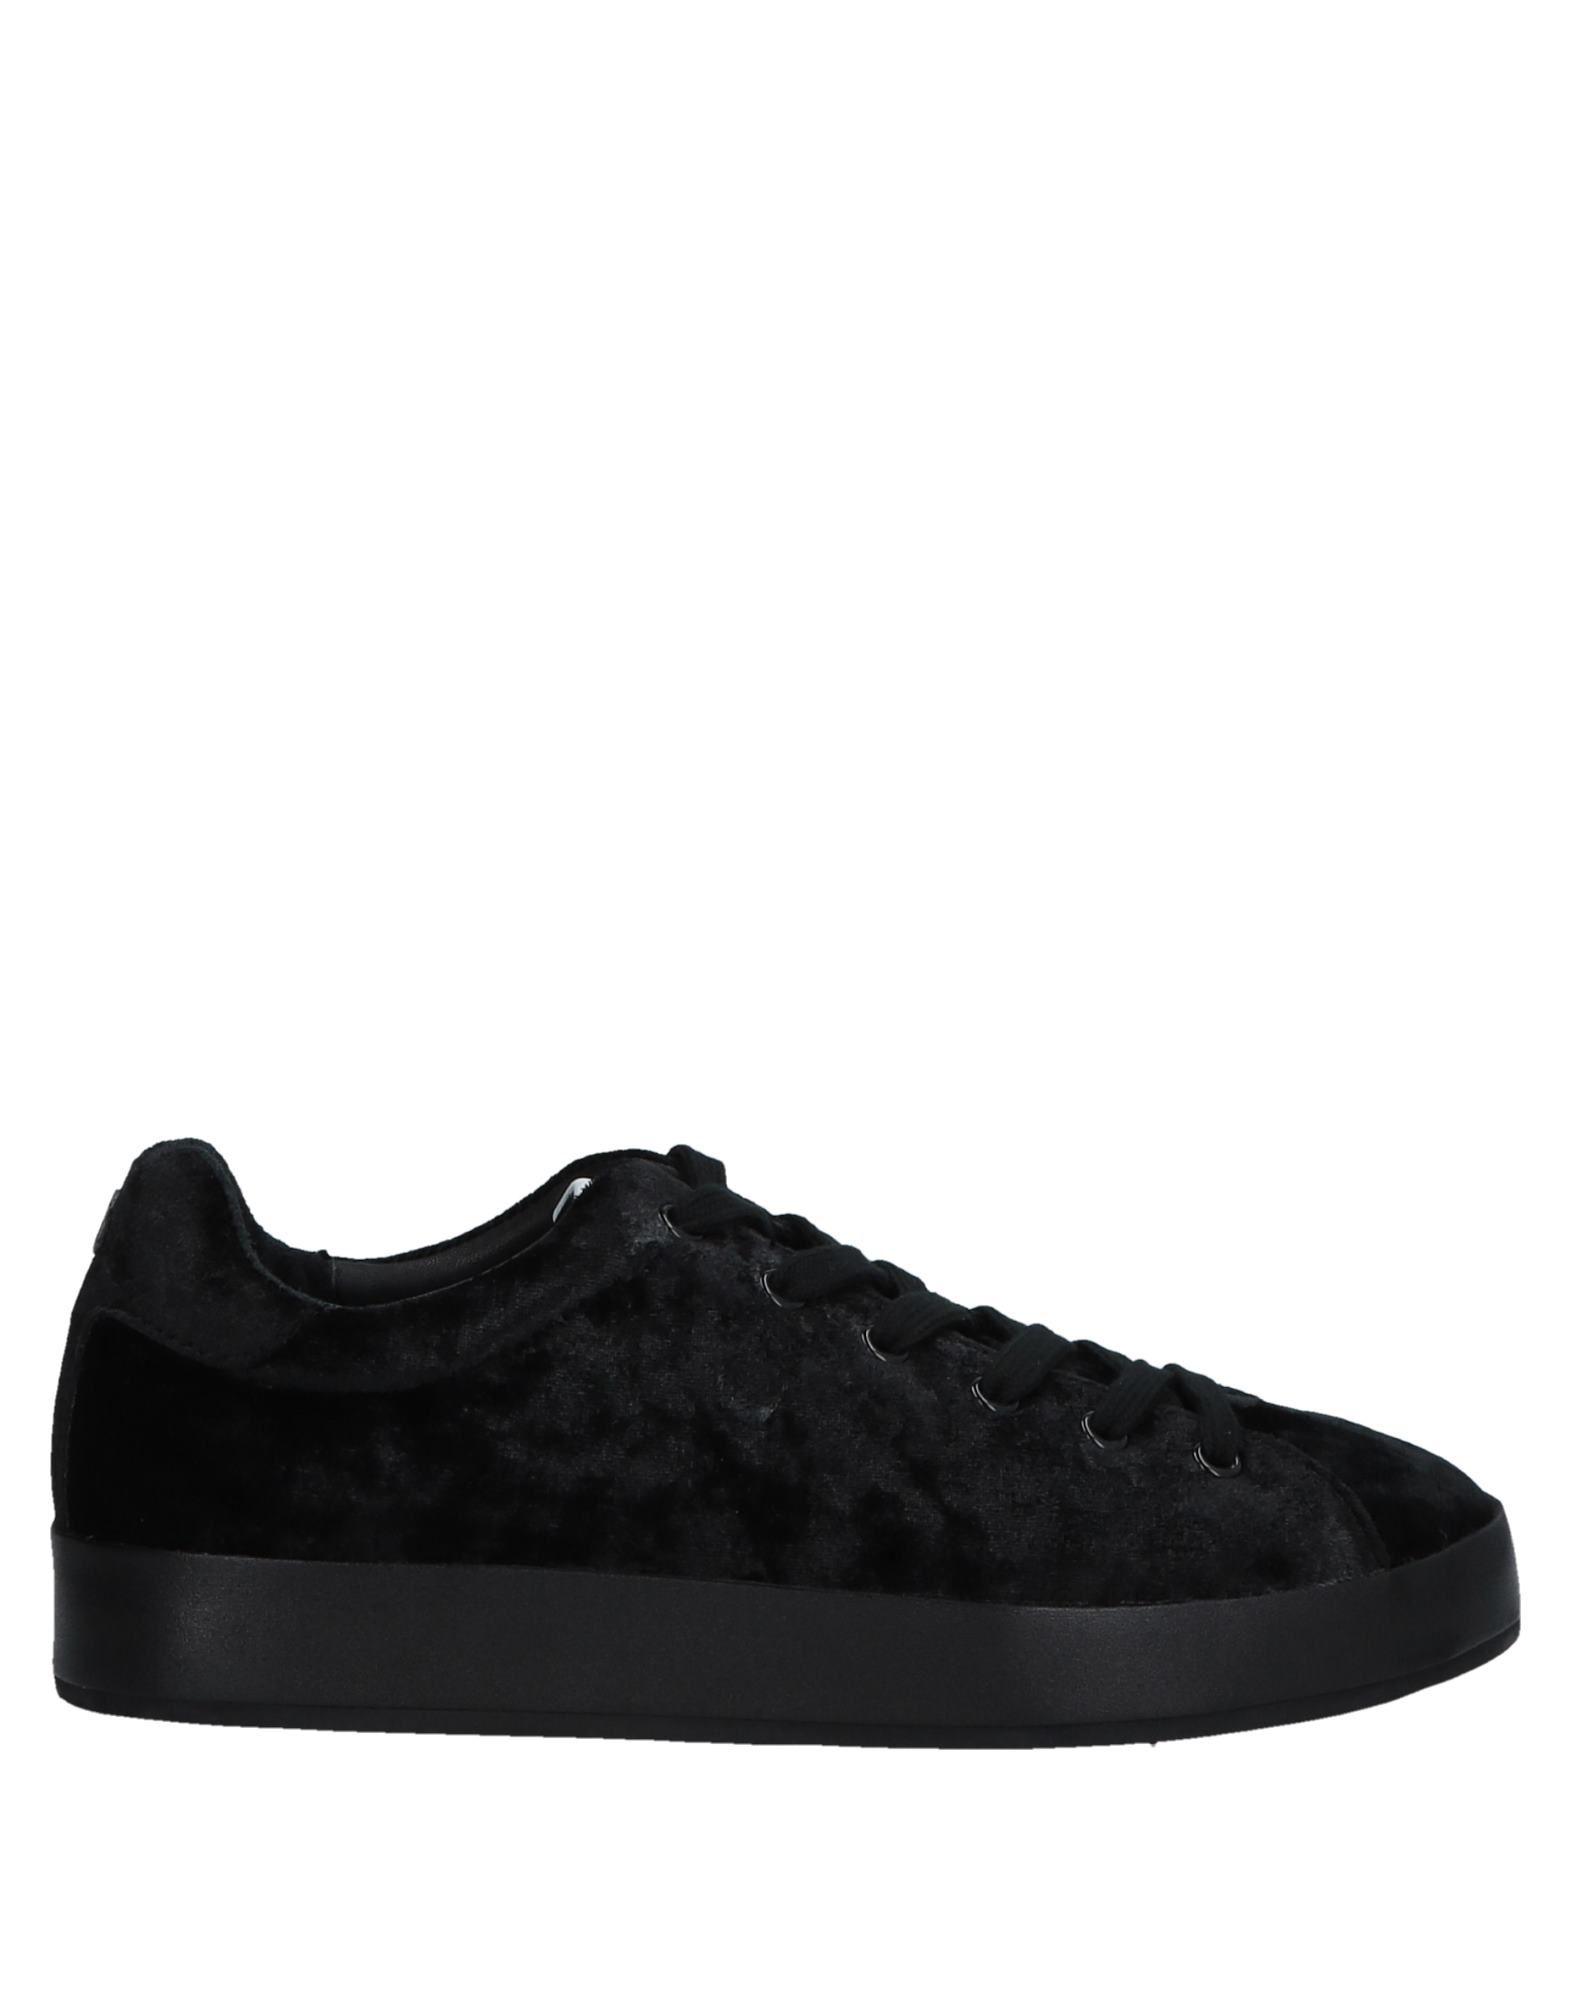 Rag & Bone Sneakers - Women Rag & Bone Sneakers - online on  Australia - Sneakers 11572420OU 07d586